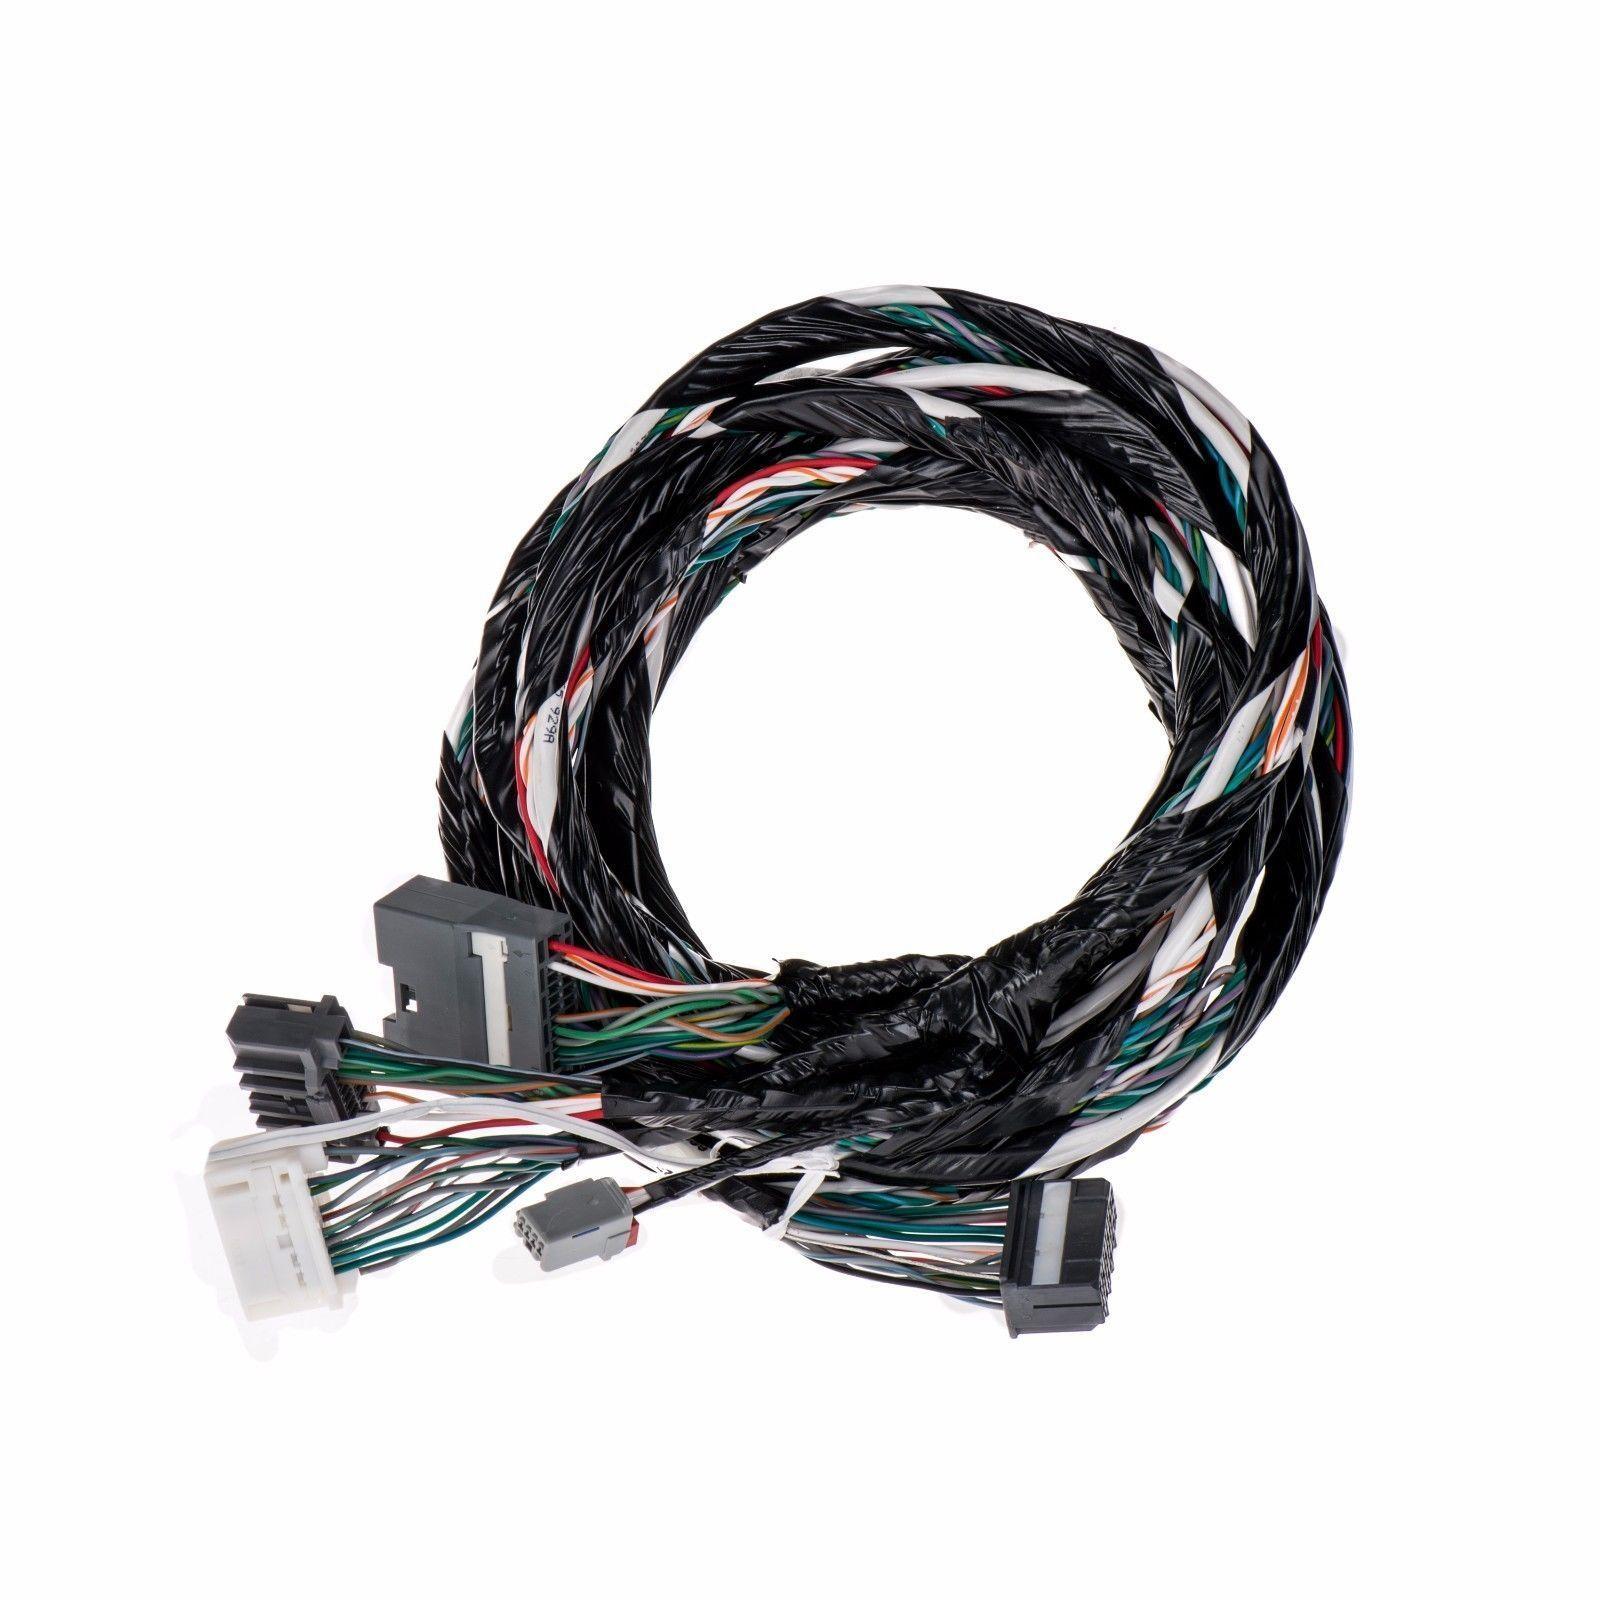 2009-2015 ram, 300, charger, caravan media radio overlay wiring harness  genuine new #parts #new #auto #genuine #car #truck